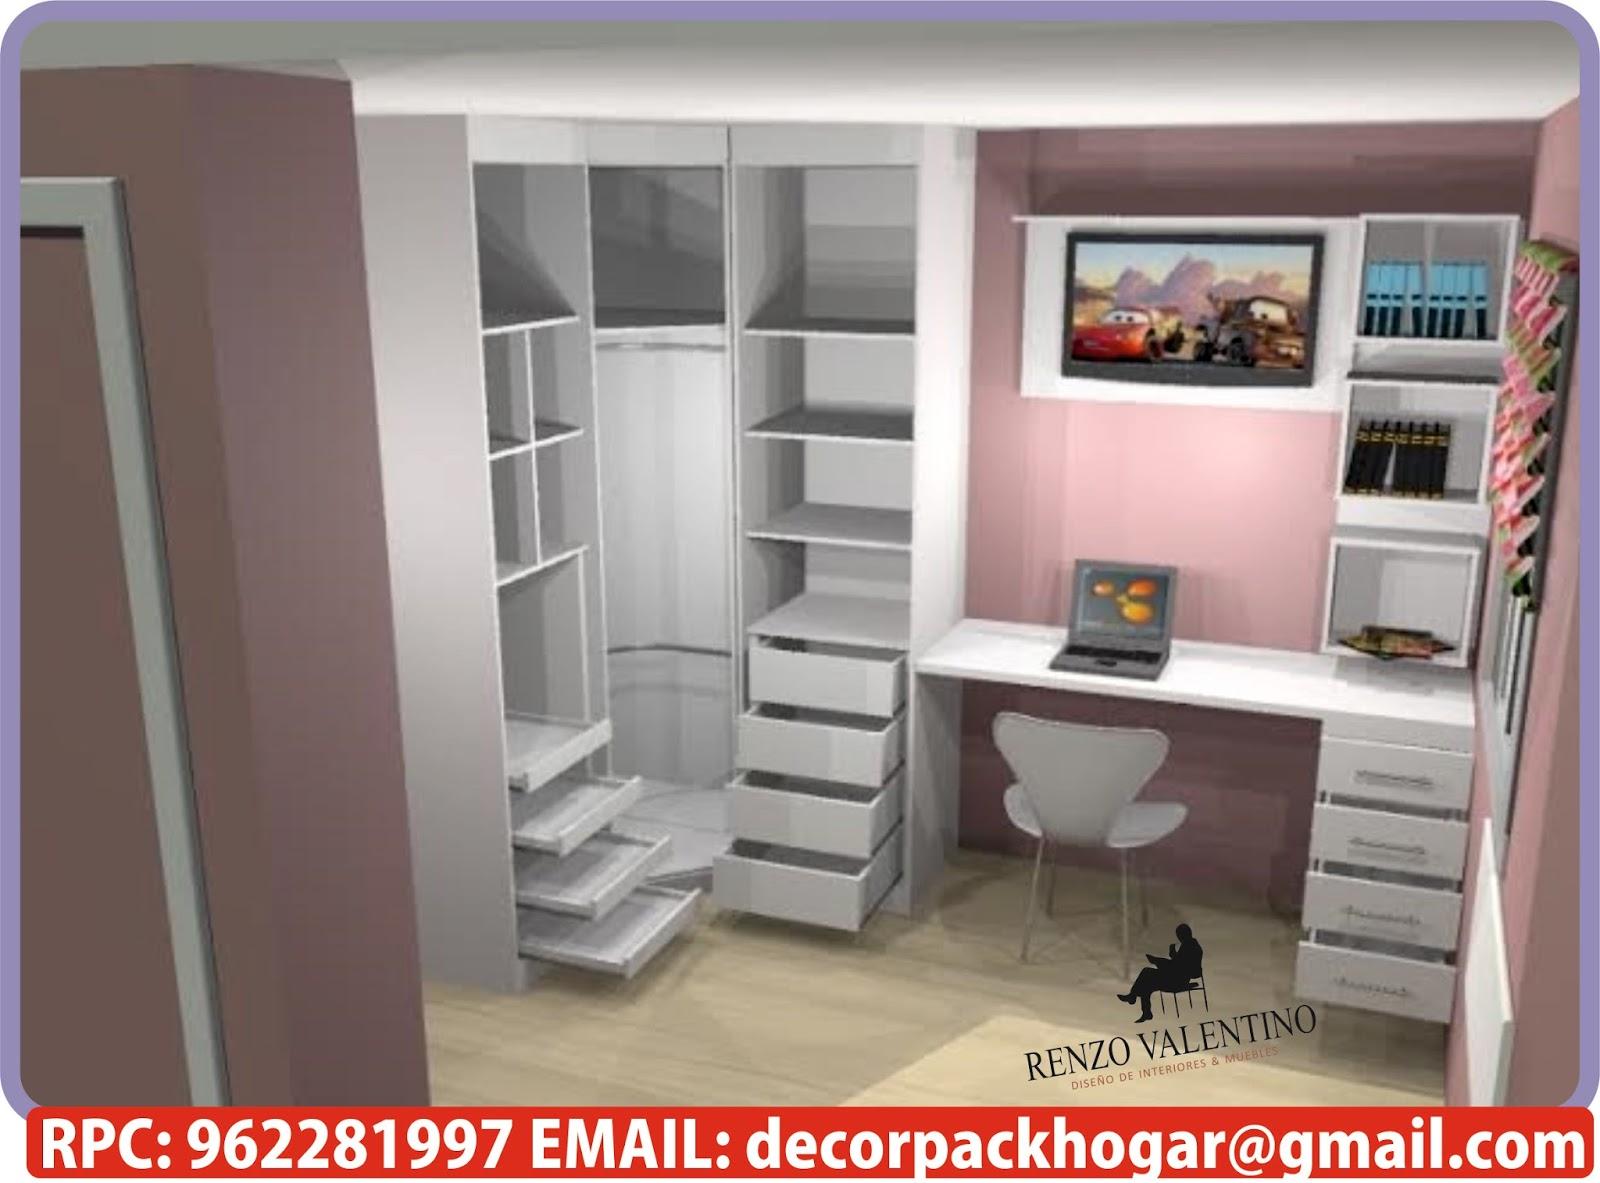 Dise os fabricacion de closet cocina y muebles de oficina rpc 962281997 modelos de closet en - Modelos de roperos empotrados ...